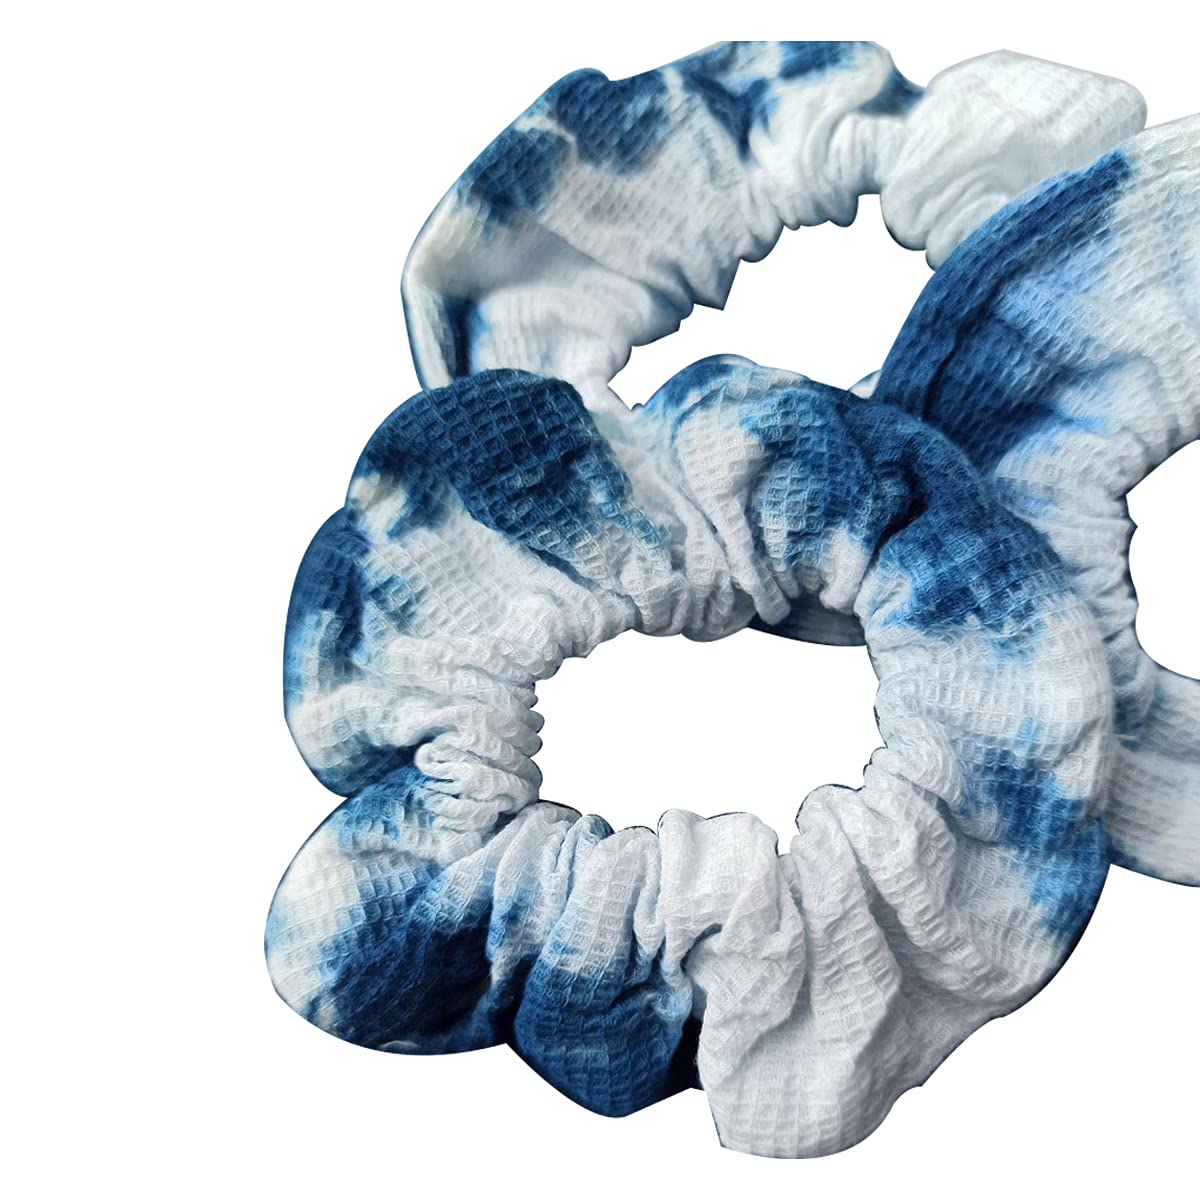 SHINE SHUNA Fine Grid Blue Tie Dye Soft Stretchy Elastic Ethnic Style Headband Expandable Hair Wrap Bandana Accessory(Random Tie-dye Pattern)